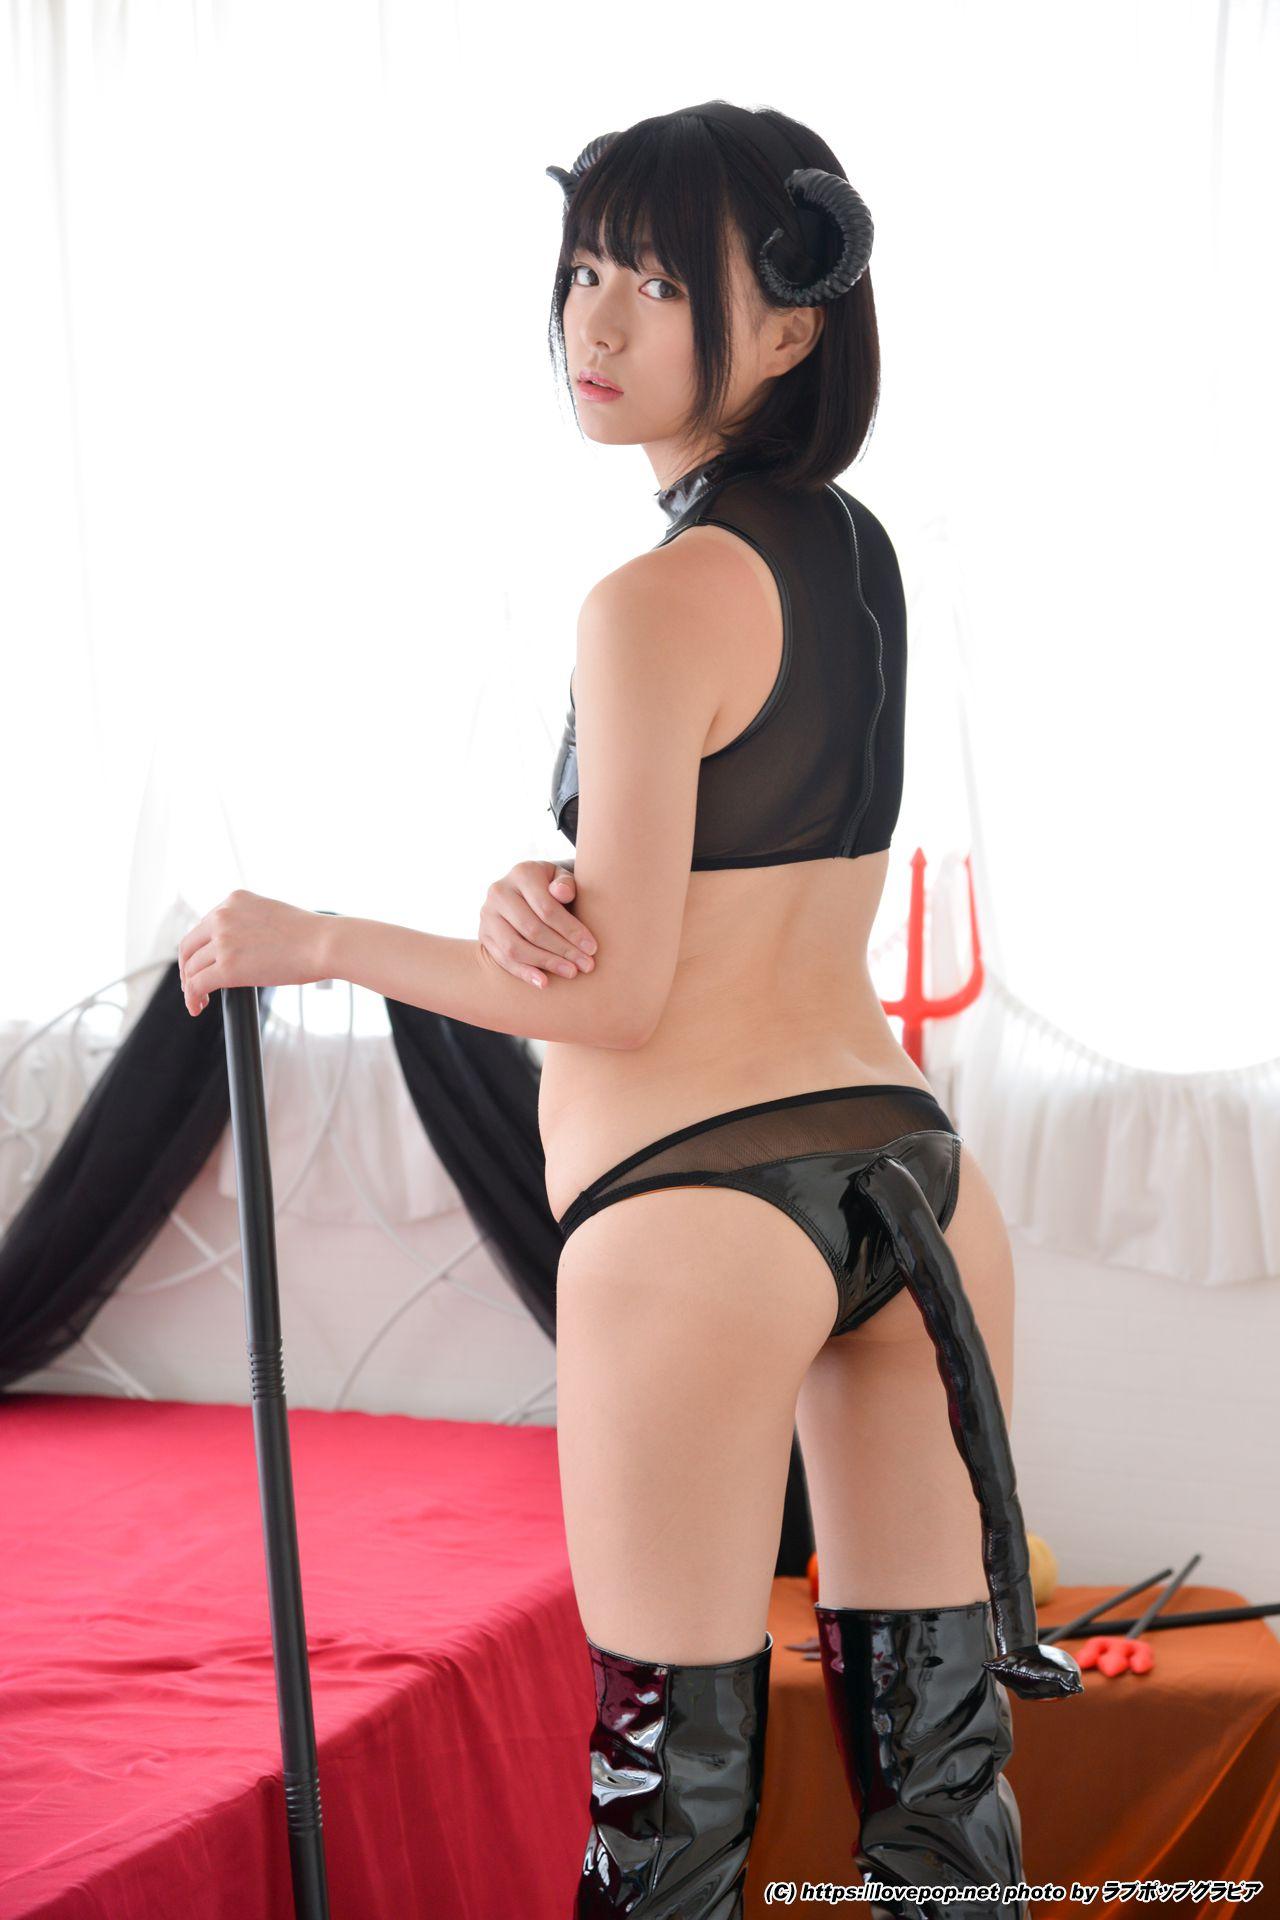 [LOVEPOP] Tsubasa Haduki 叶月つばさ Photoset 17[70P]插图(7)